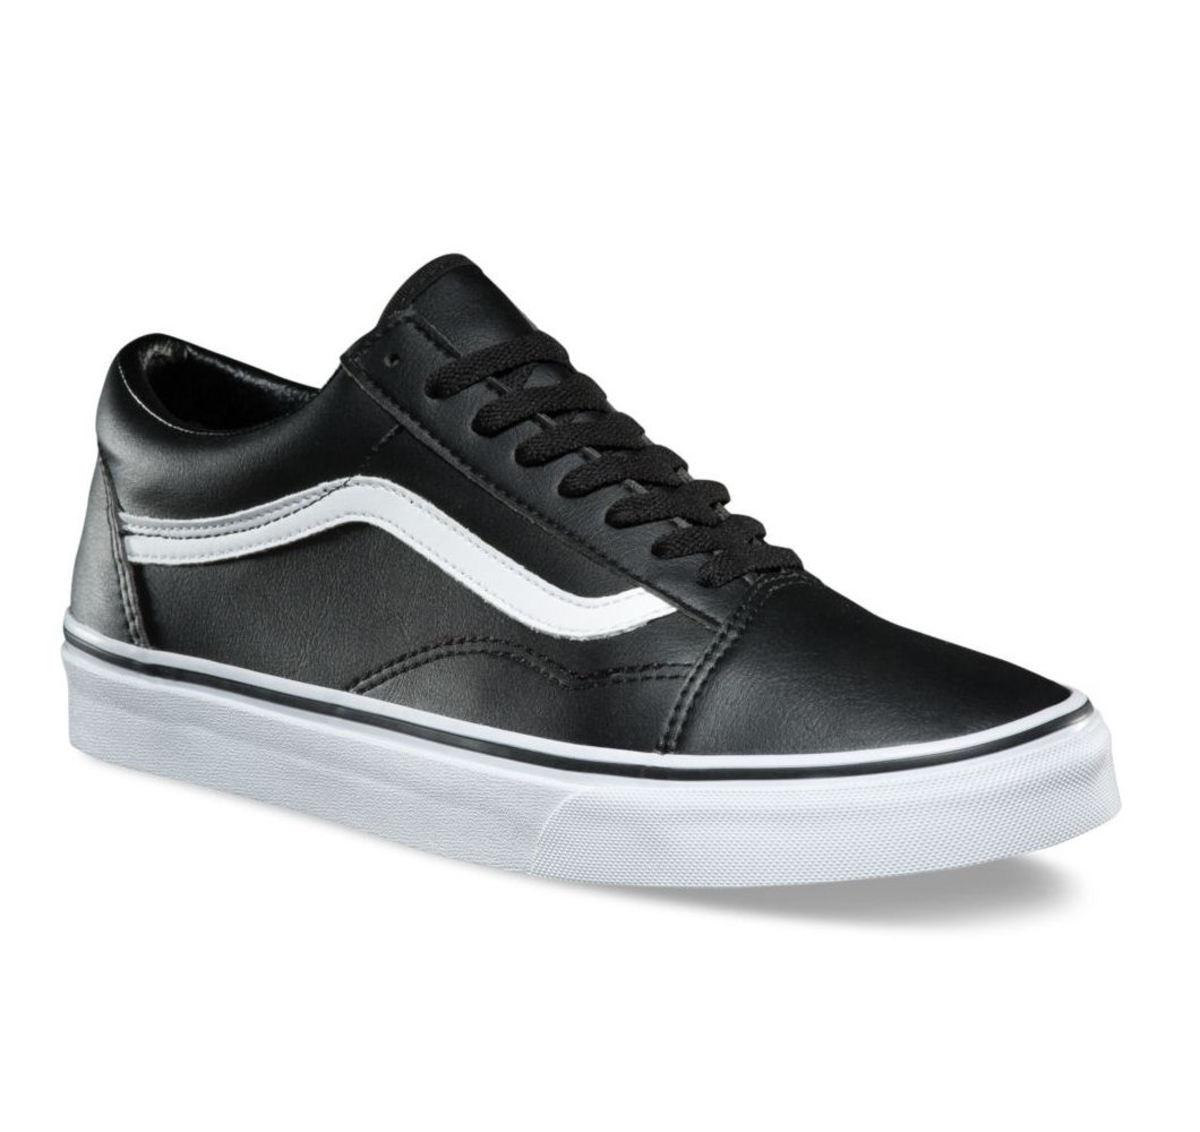 8fe2e017504 topánky VANS - UA Old Skool - (CLASSIC TUMBLE) - VN0A38G1NQR ...